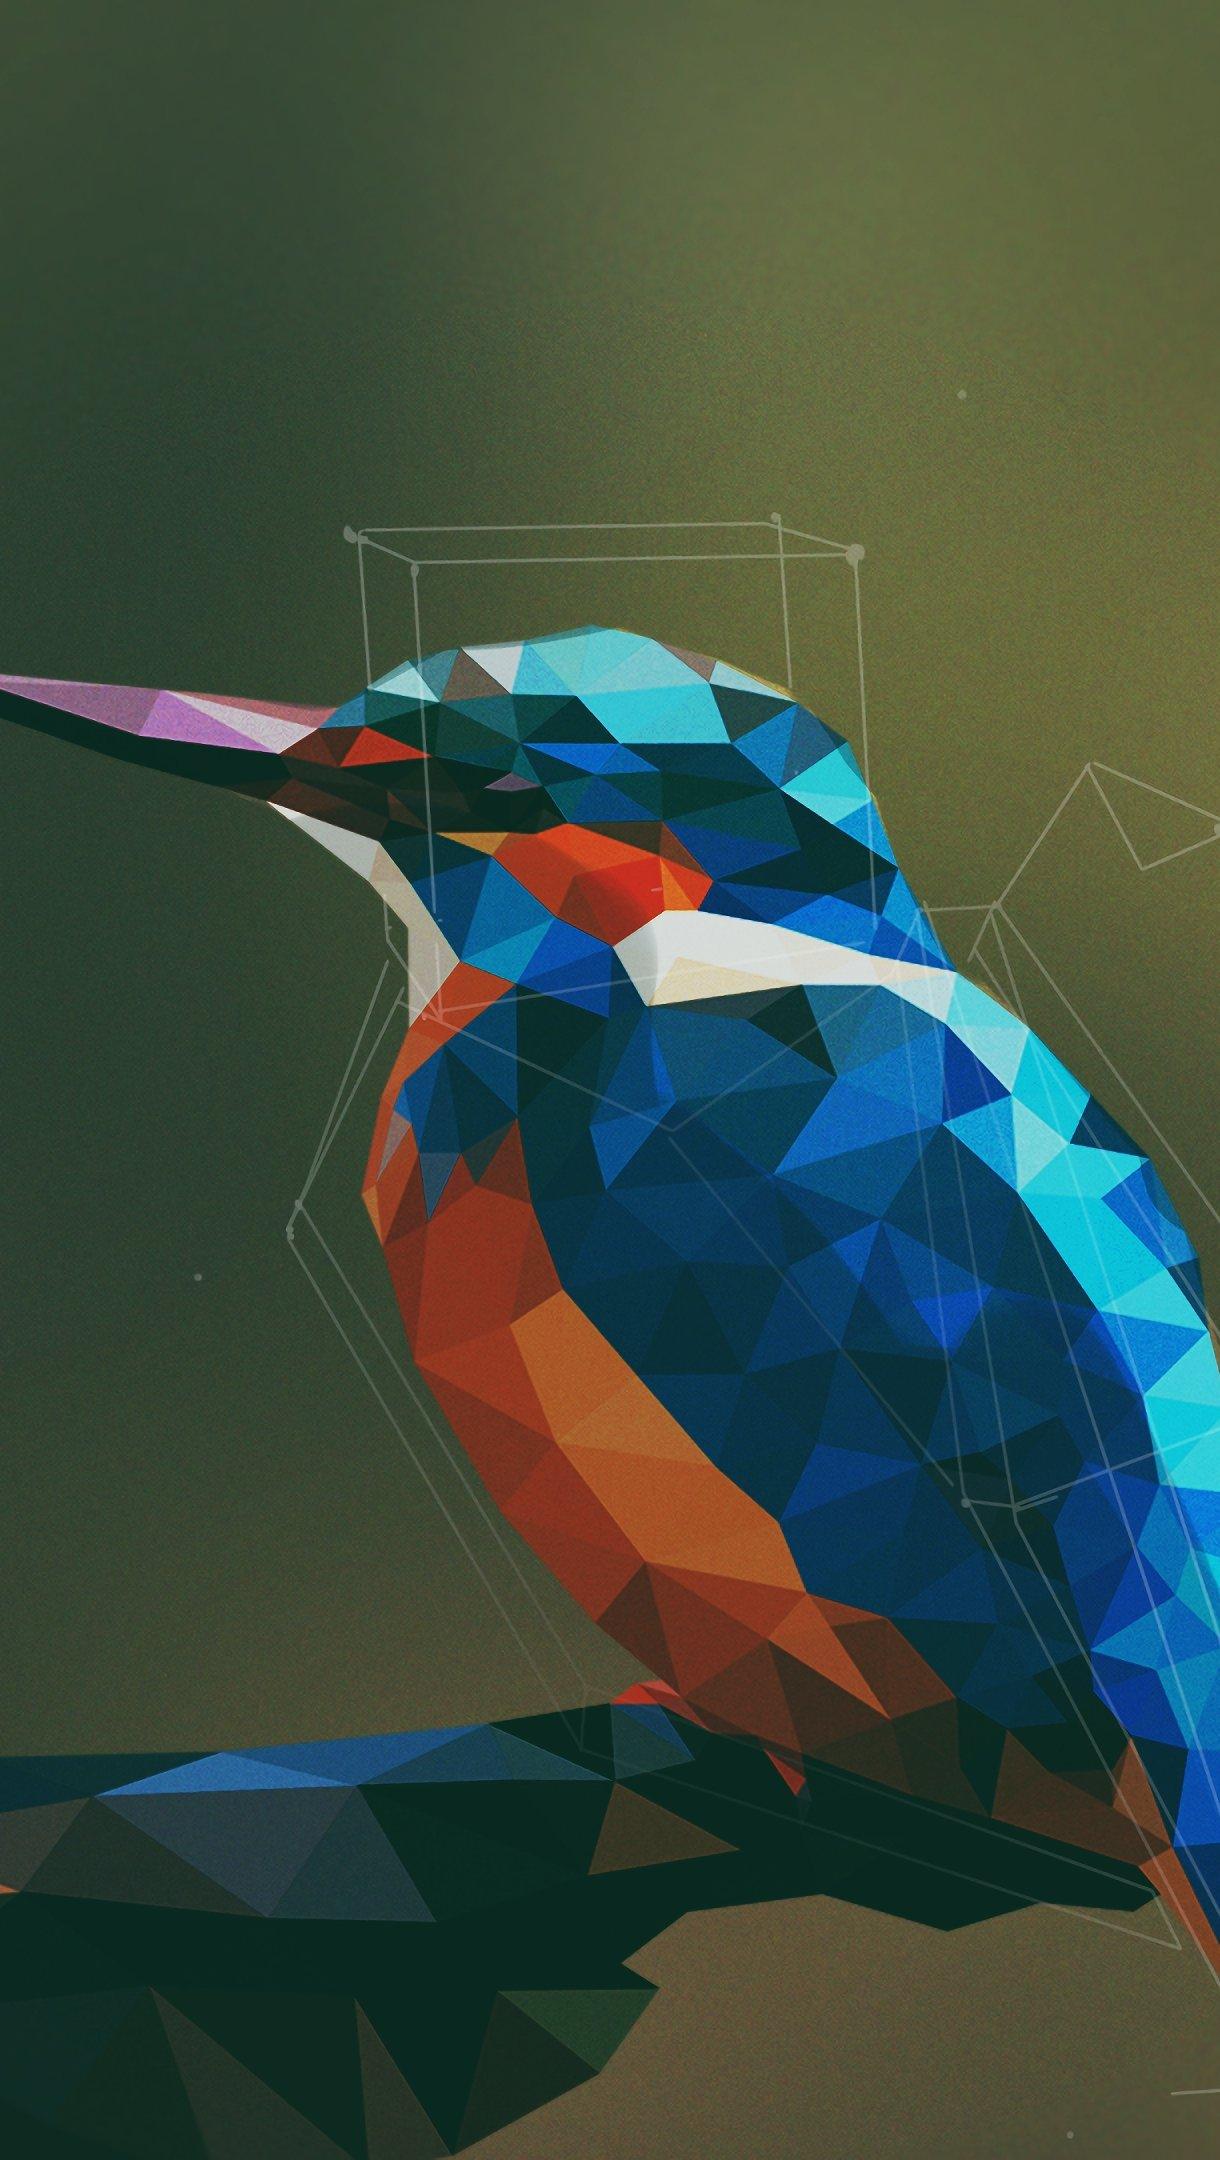 Fondos de pantalla Pájaro abstracto con arte digital Vertical